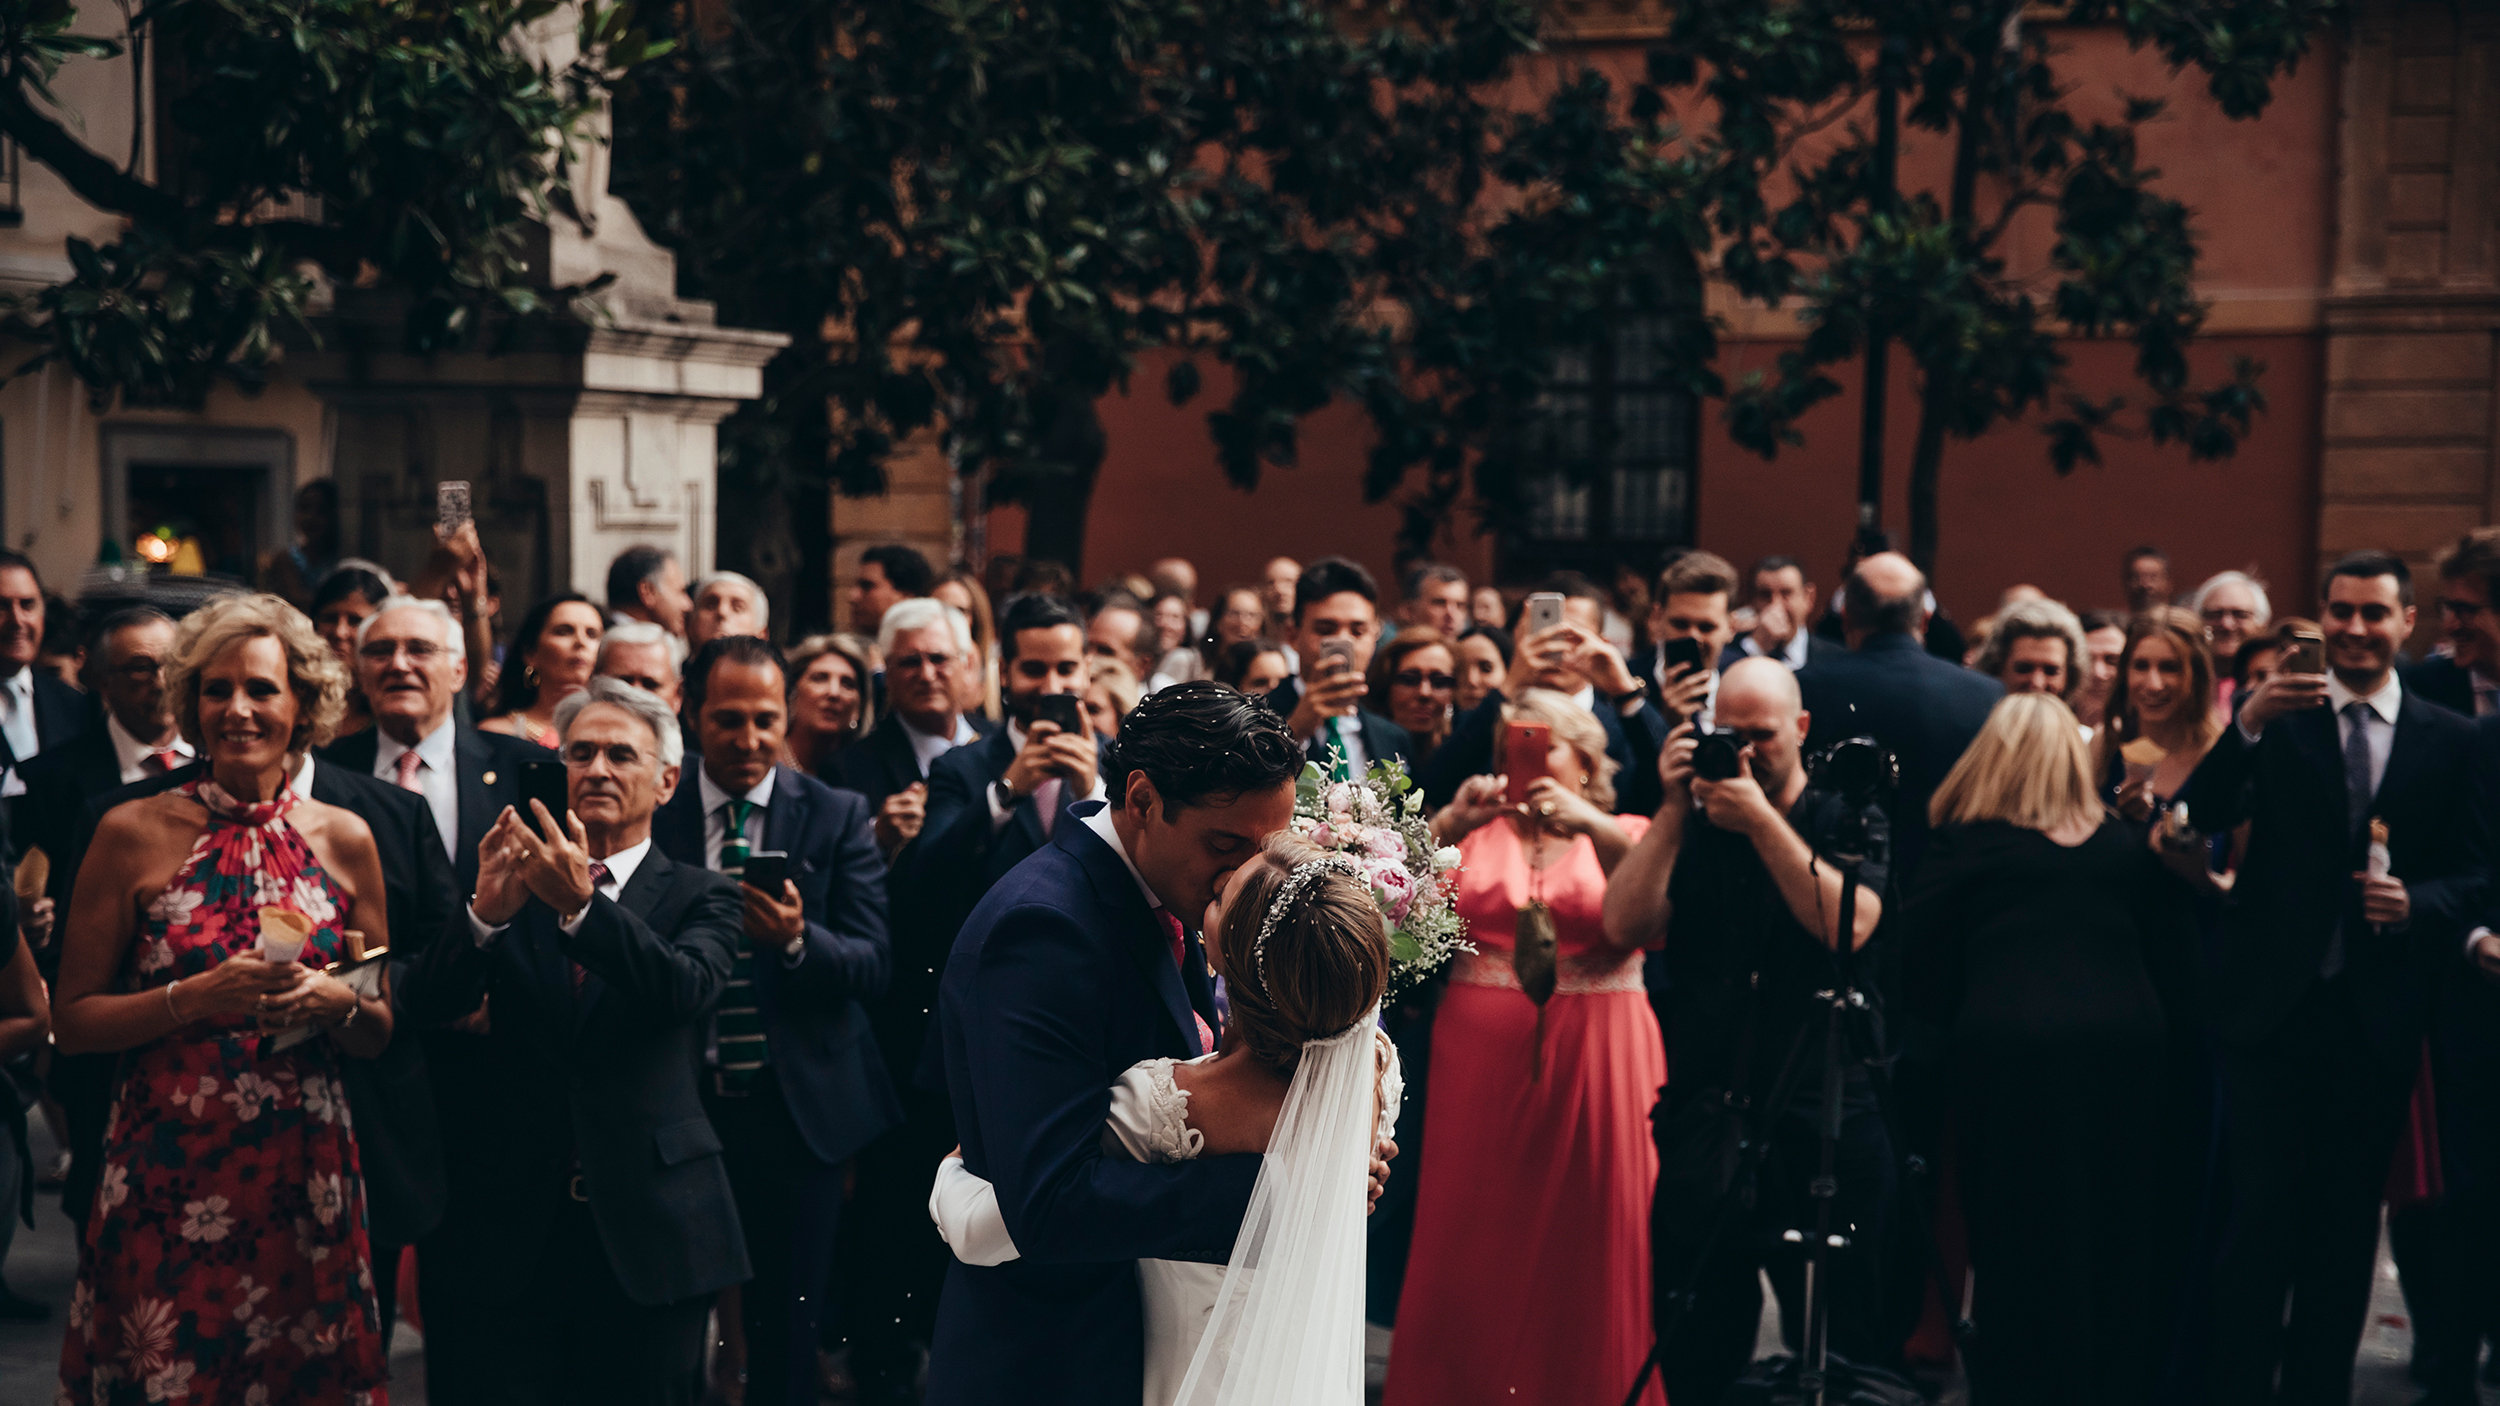 fotografo-bodas-granada-catedral-sagrario-jose-reyes_051.jpg